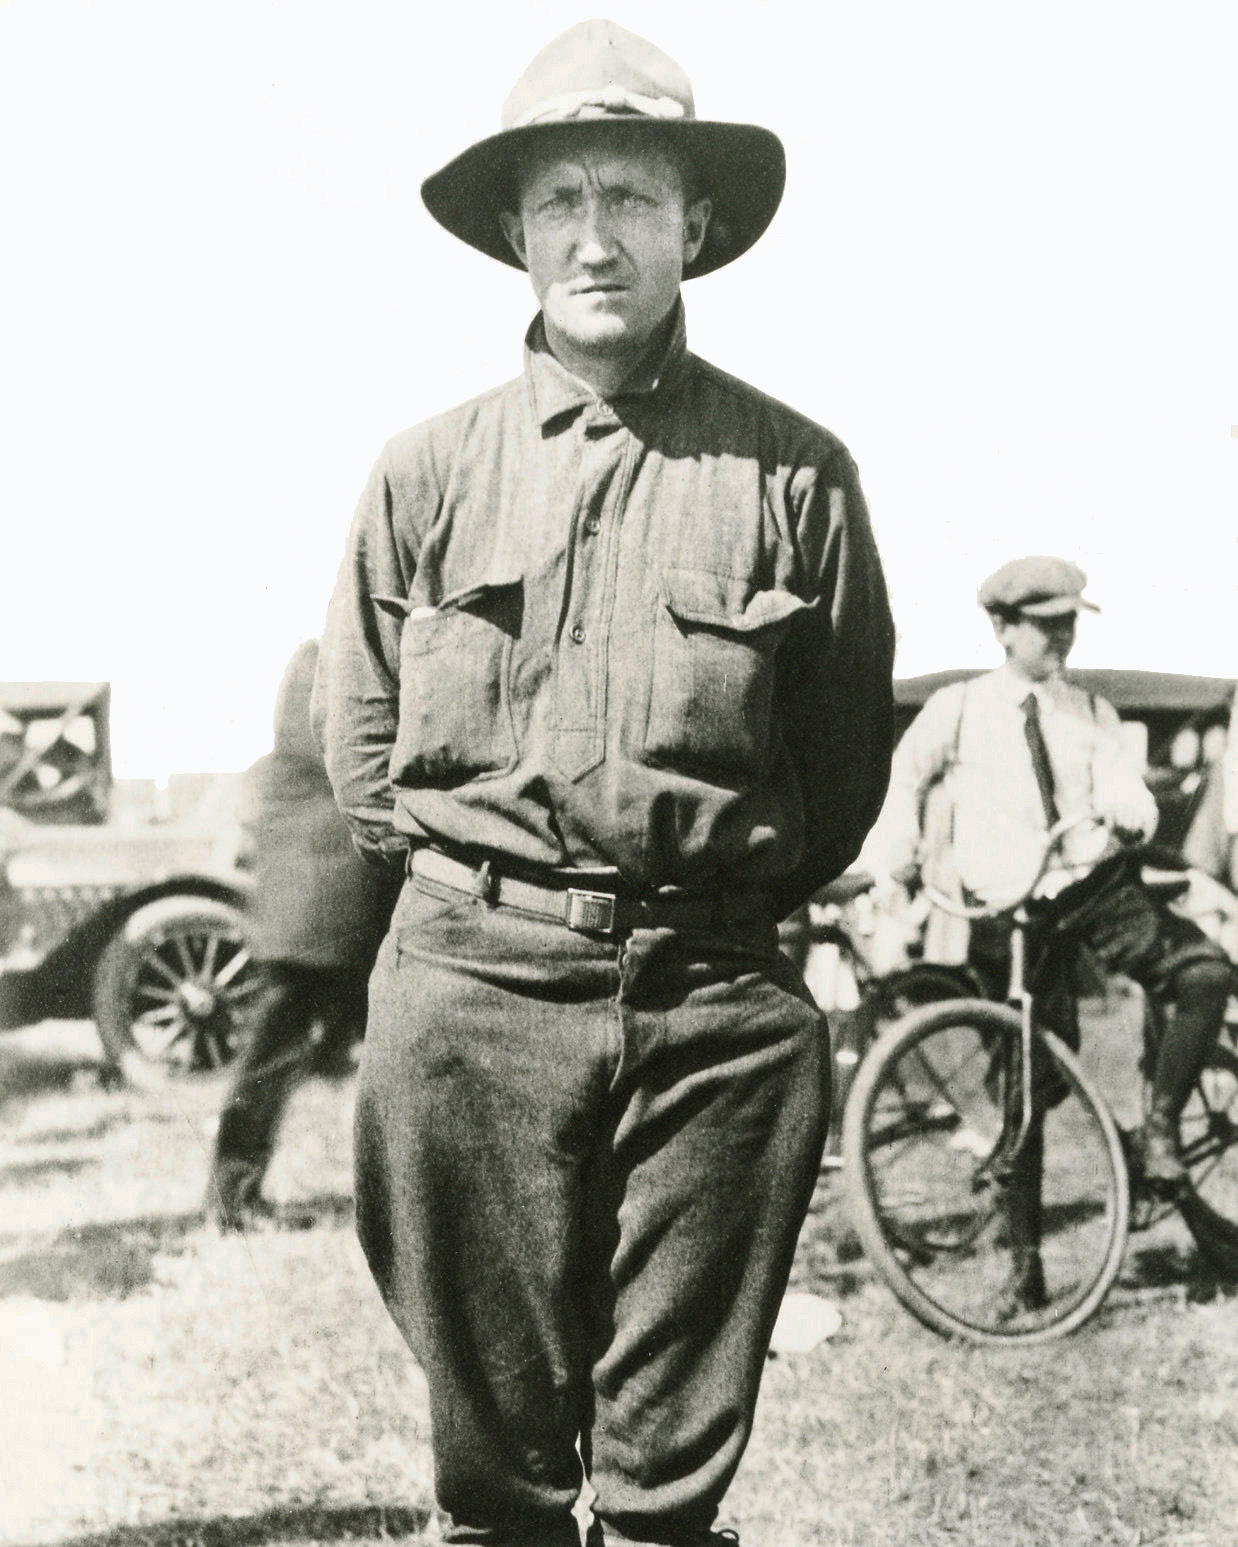 Corporal Homer Wheaton